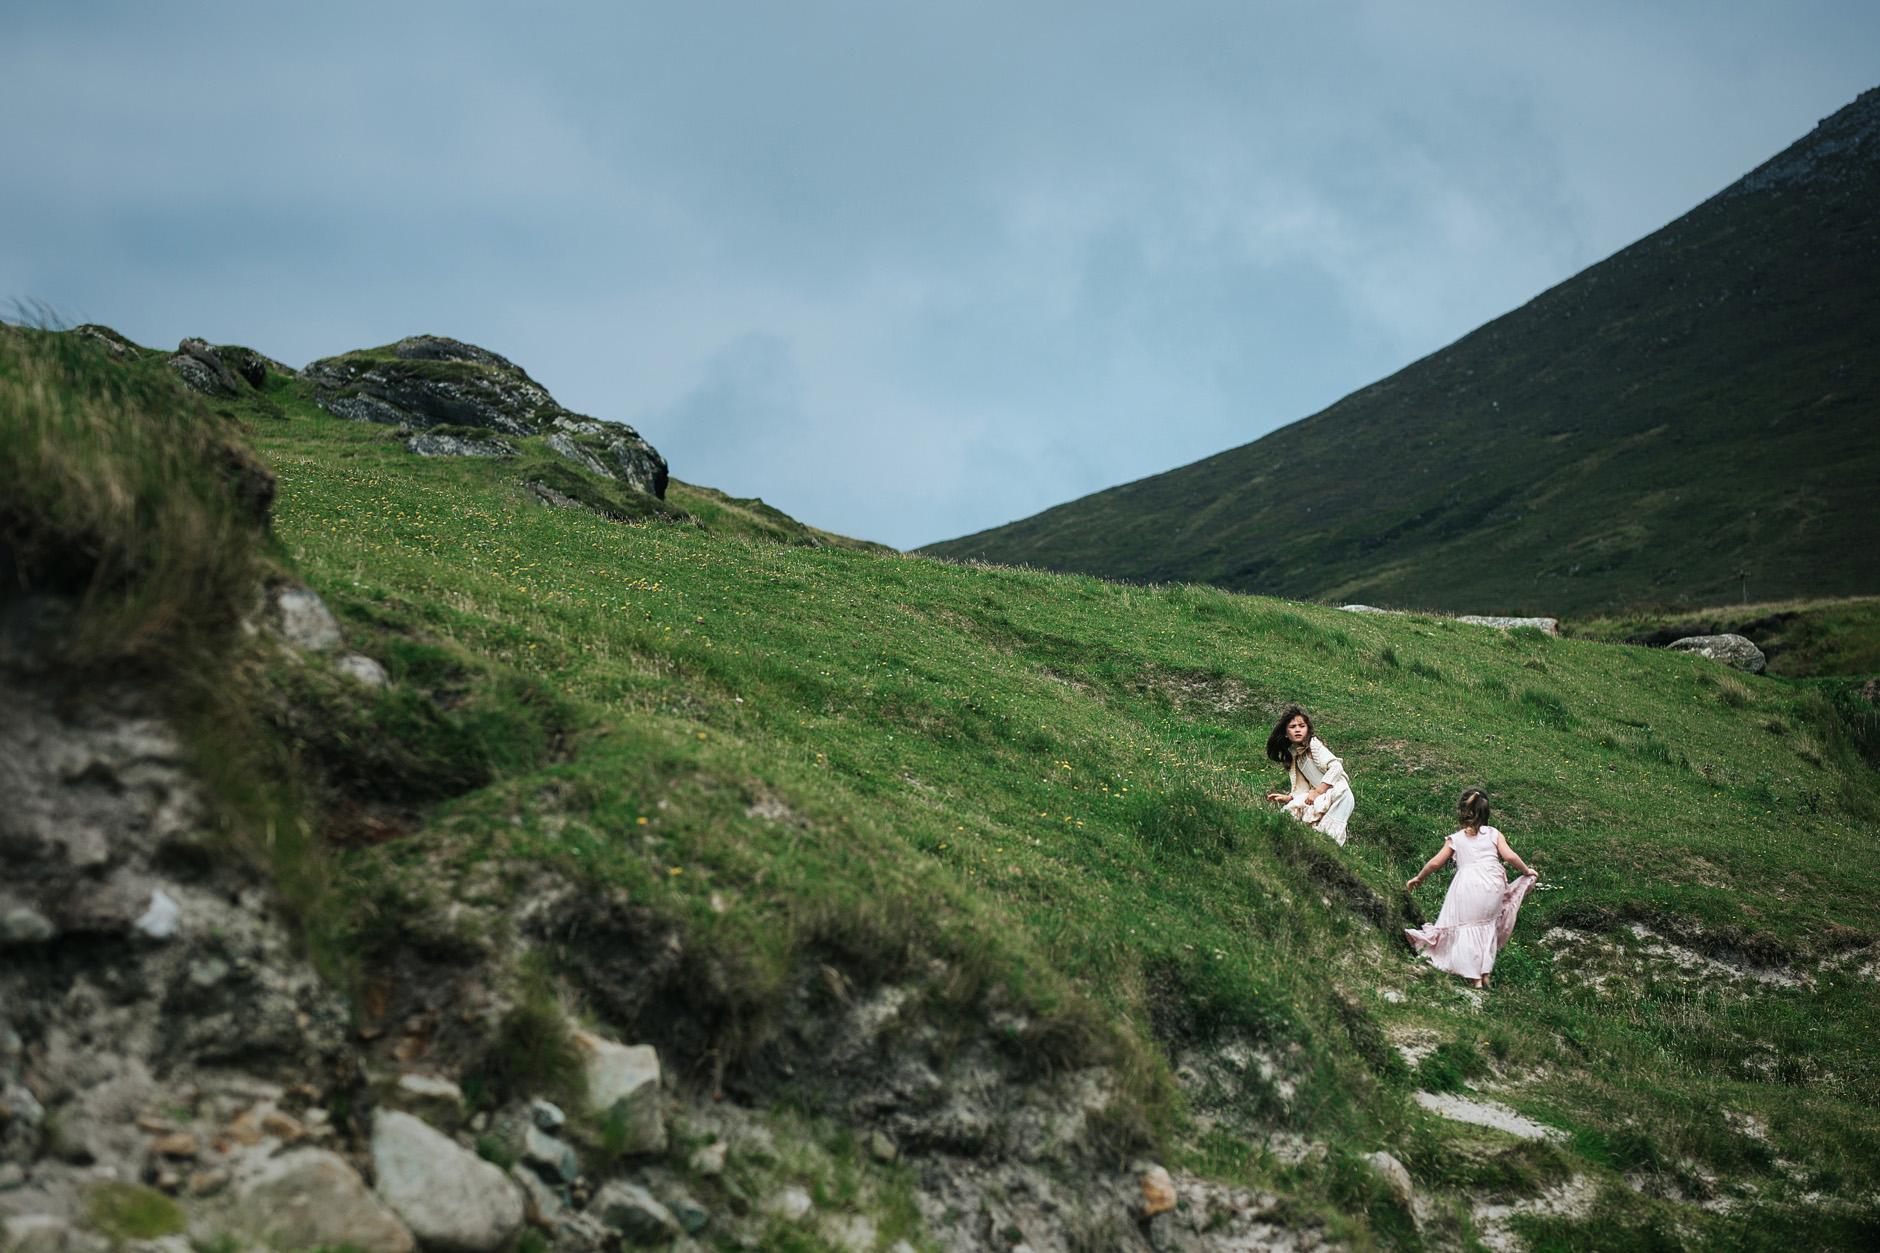 stunning-beach-family-vacation-photoshoot-achill-island-ireland-0002.jpg